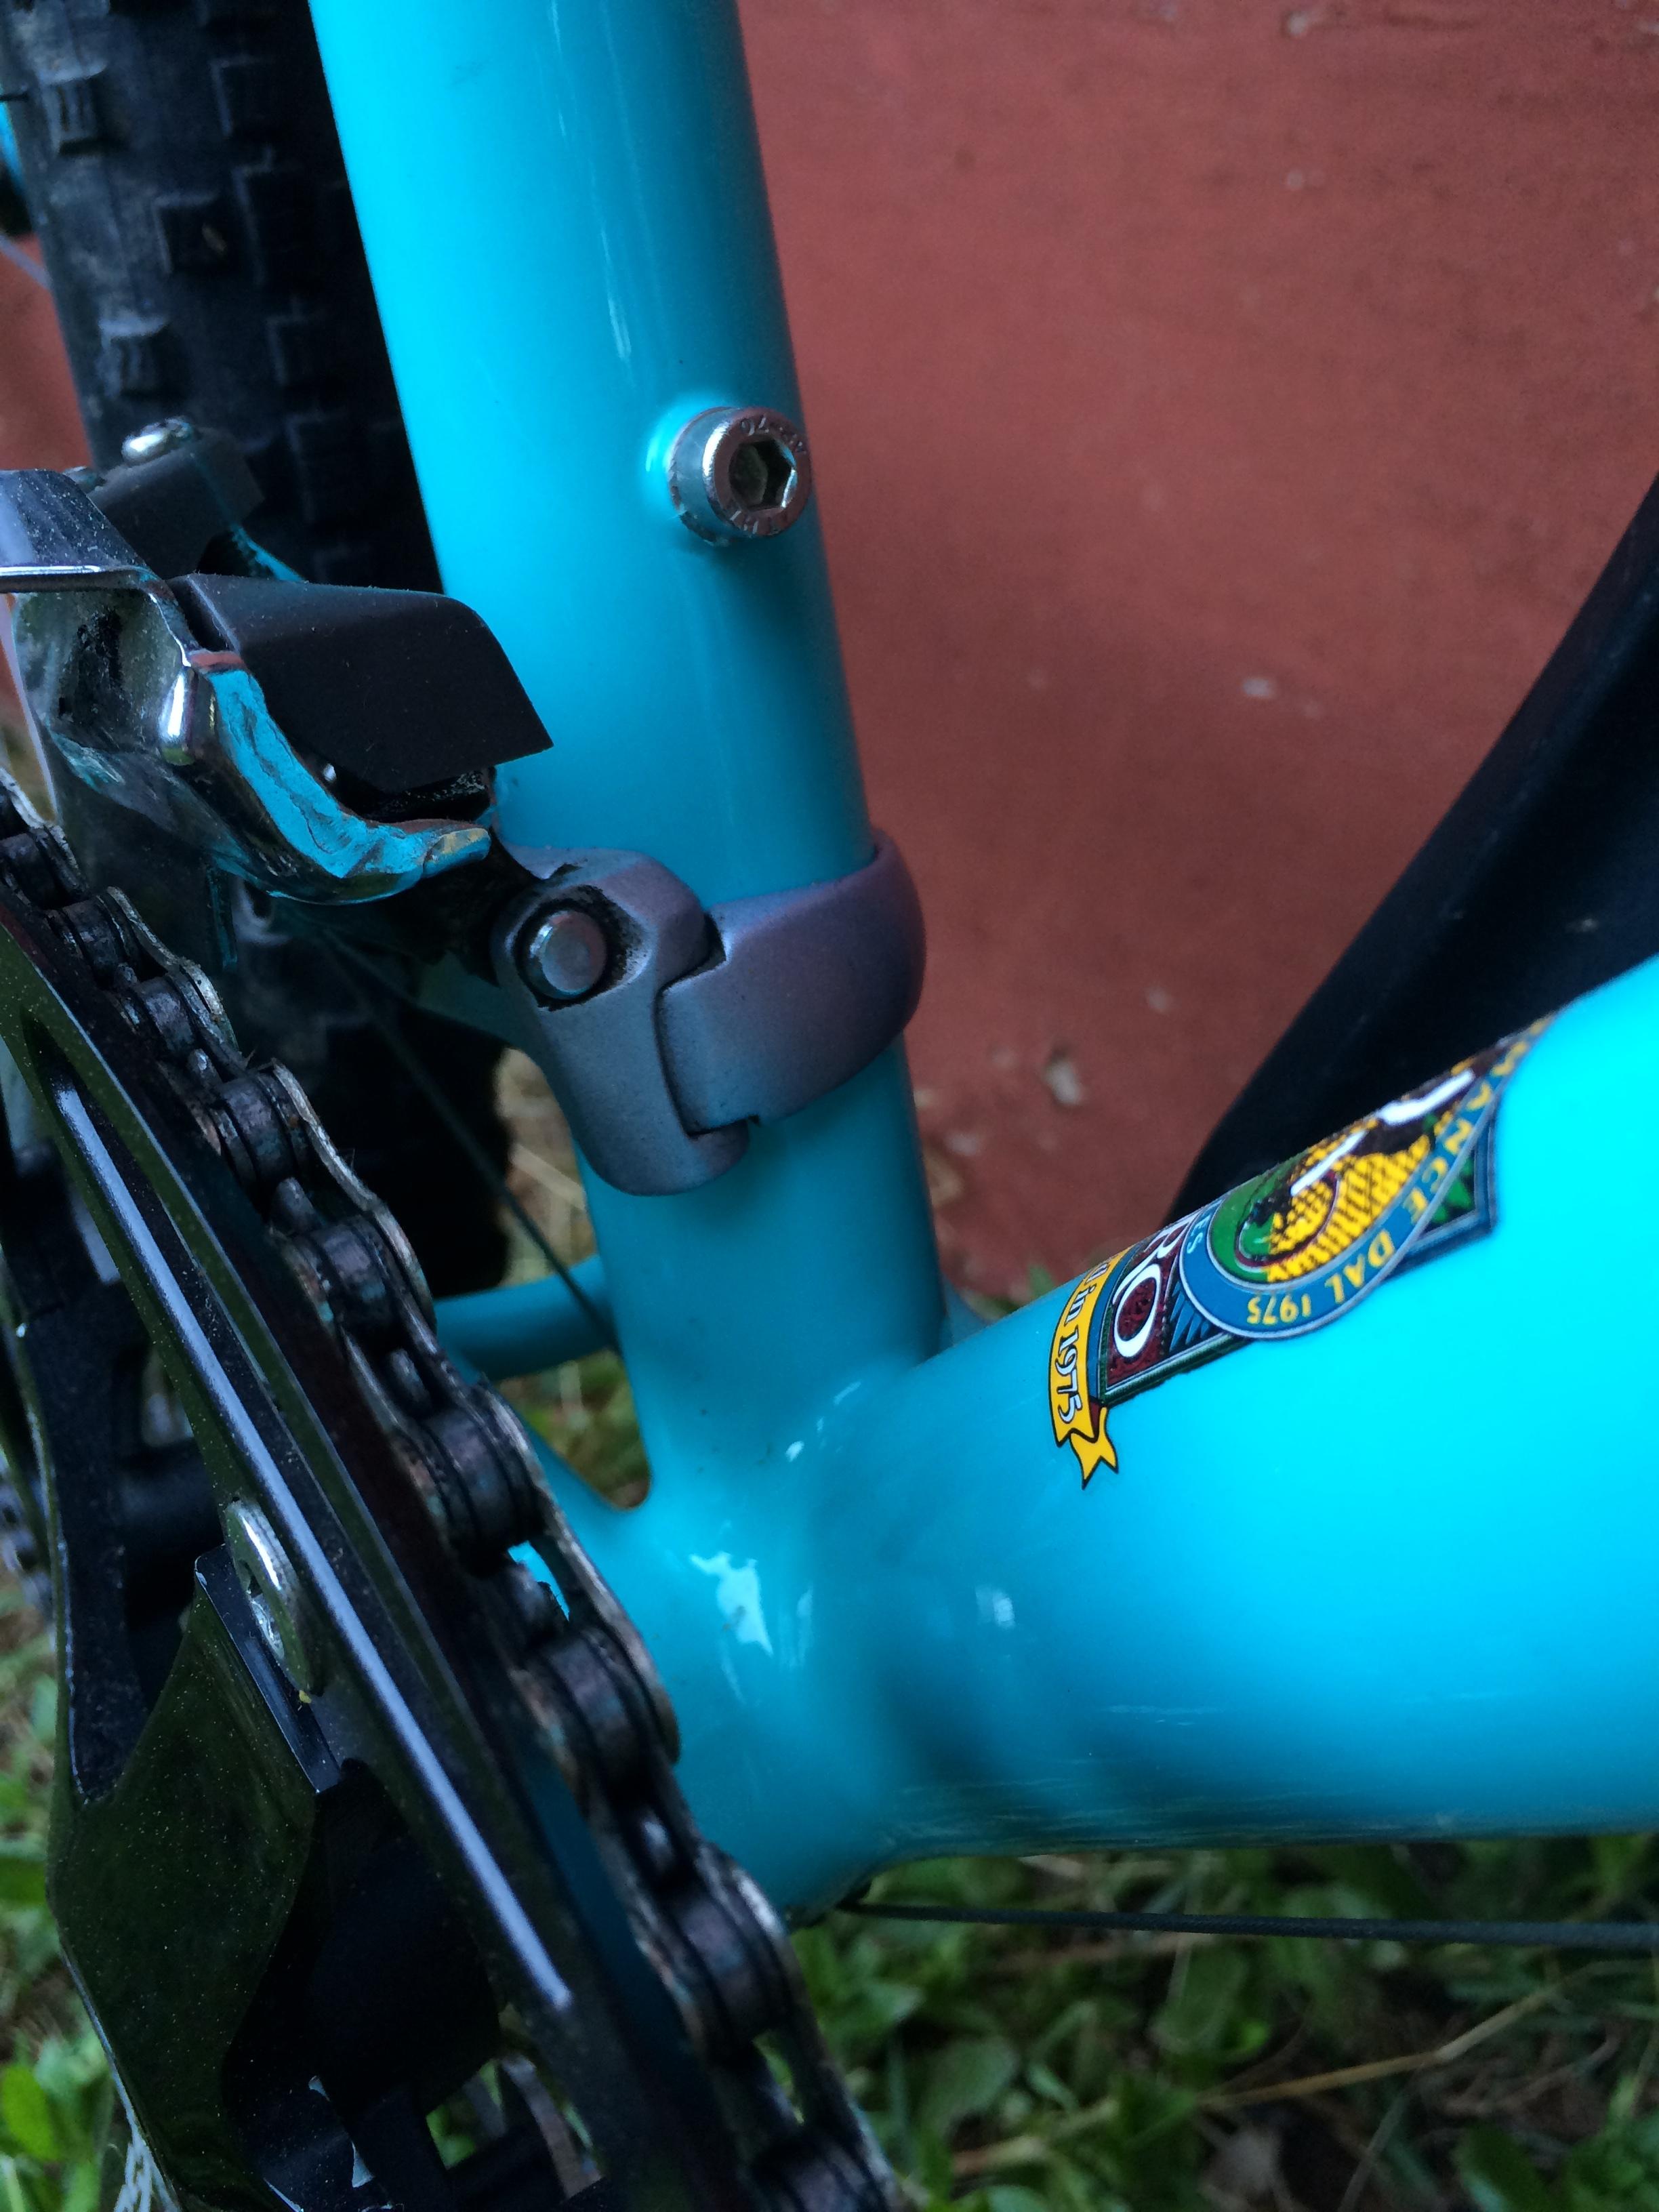 Dogwood-cycleworx-steel-custom-bicycle-columbus-tubing-cyclo-cross-5.jpg